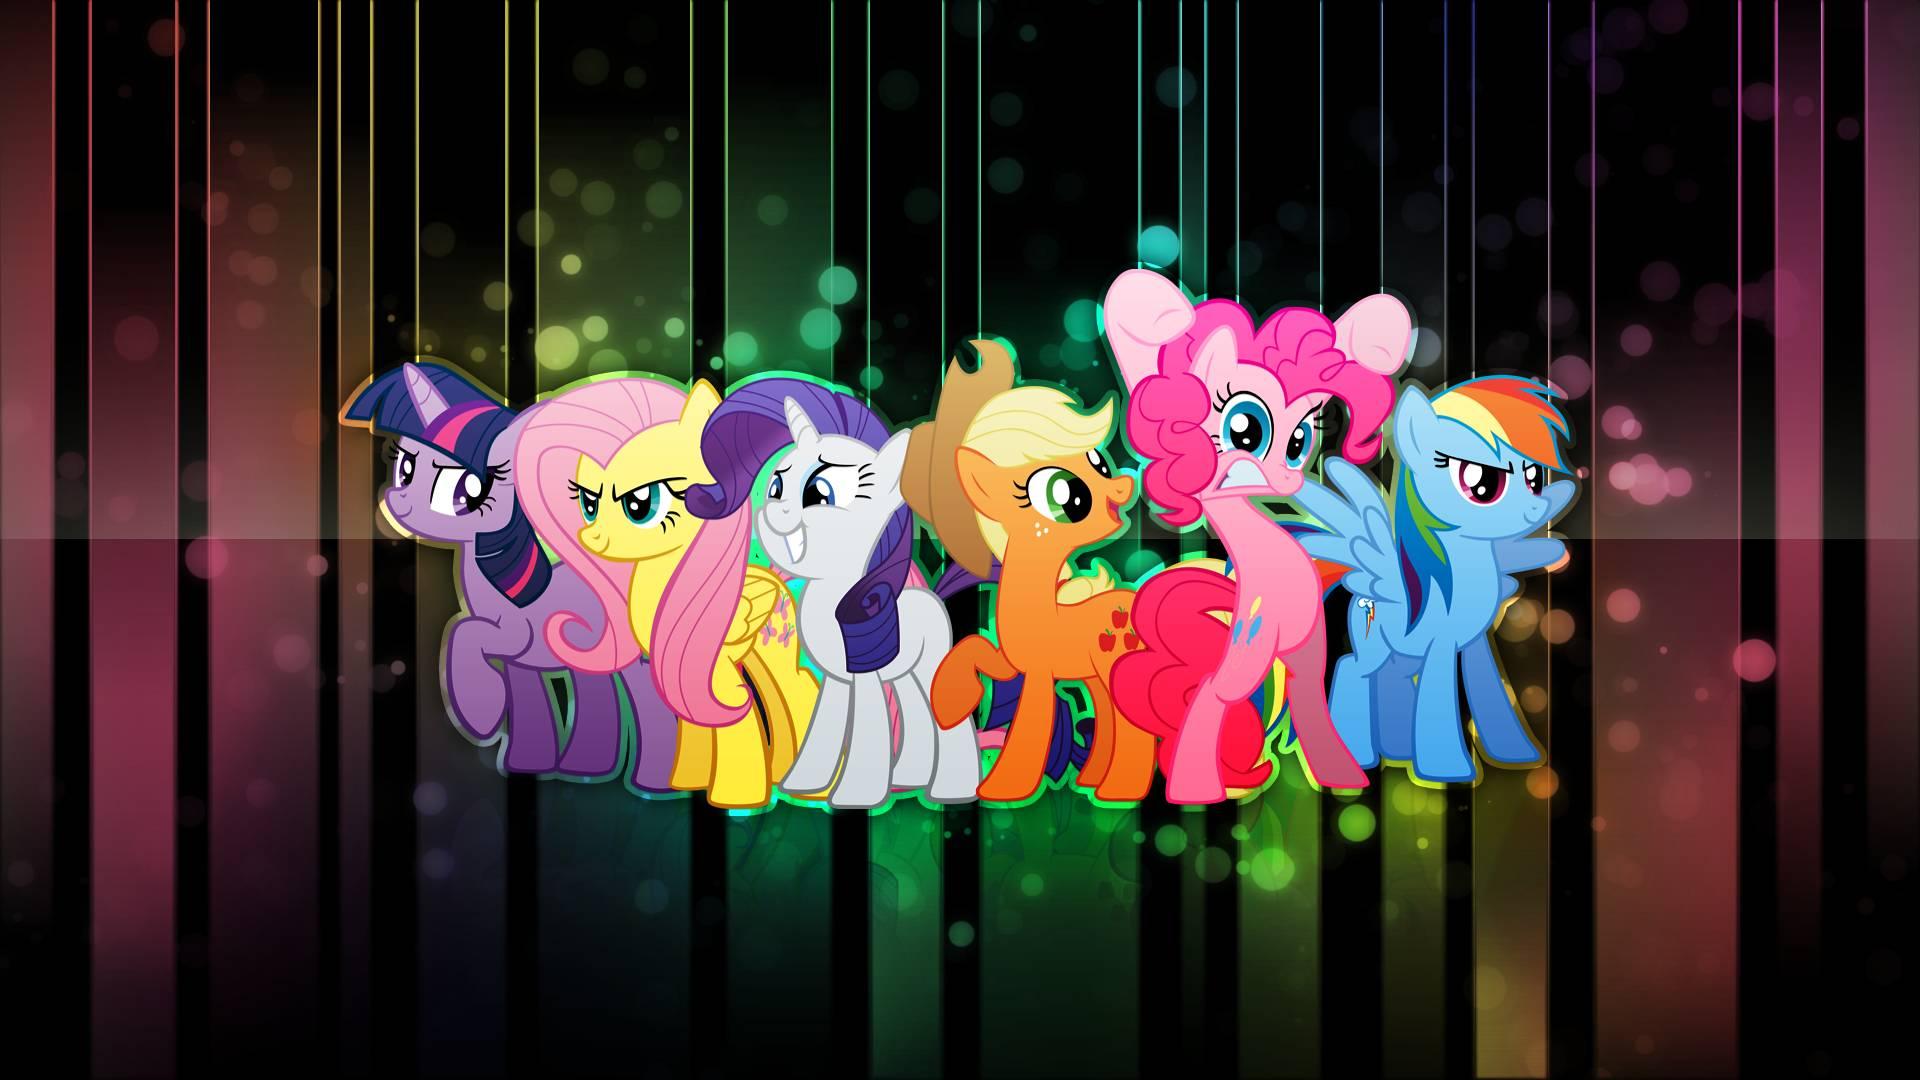 Free Download Mane6 My Little Pony Friendship Is Magic Wallpaper